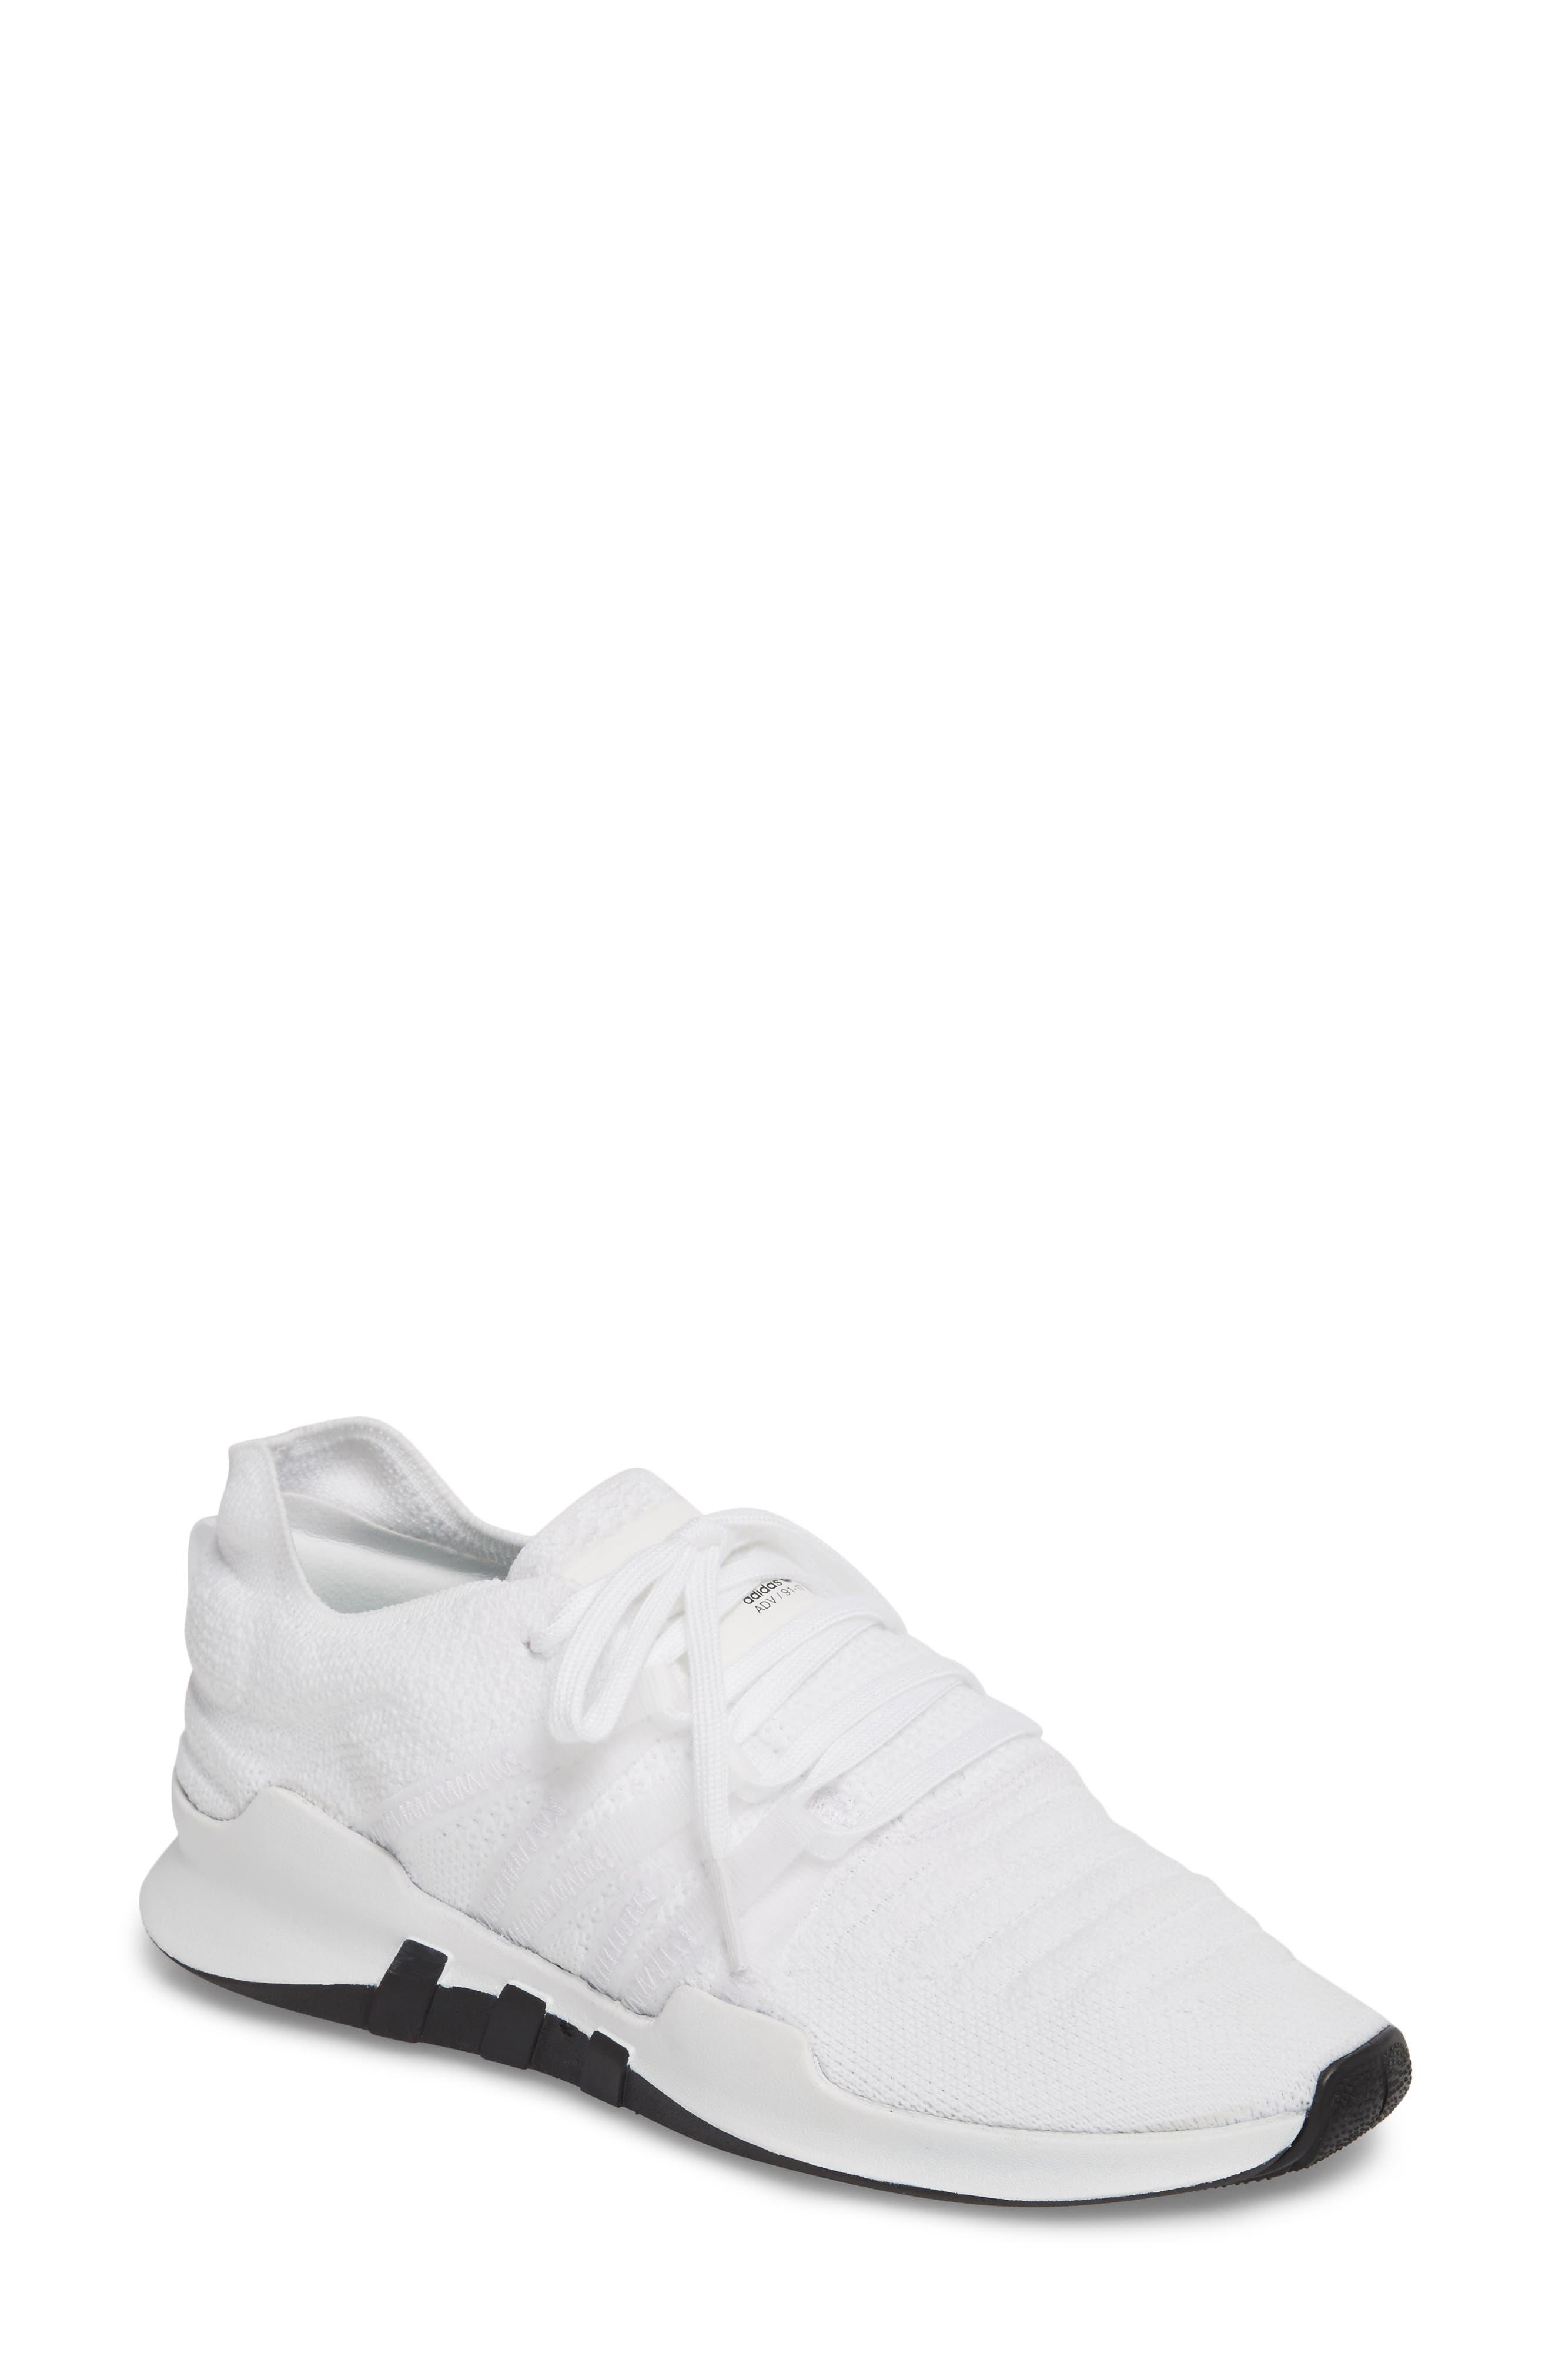 adidas EQT Racing ADV Primeknit Sneaker (Women)